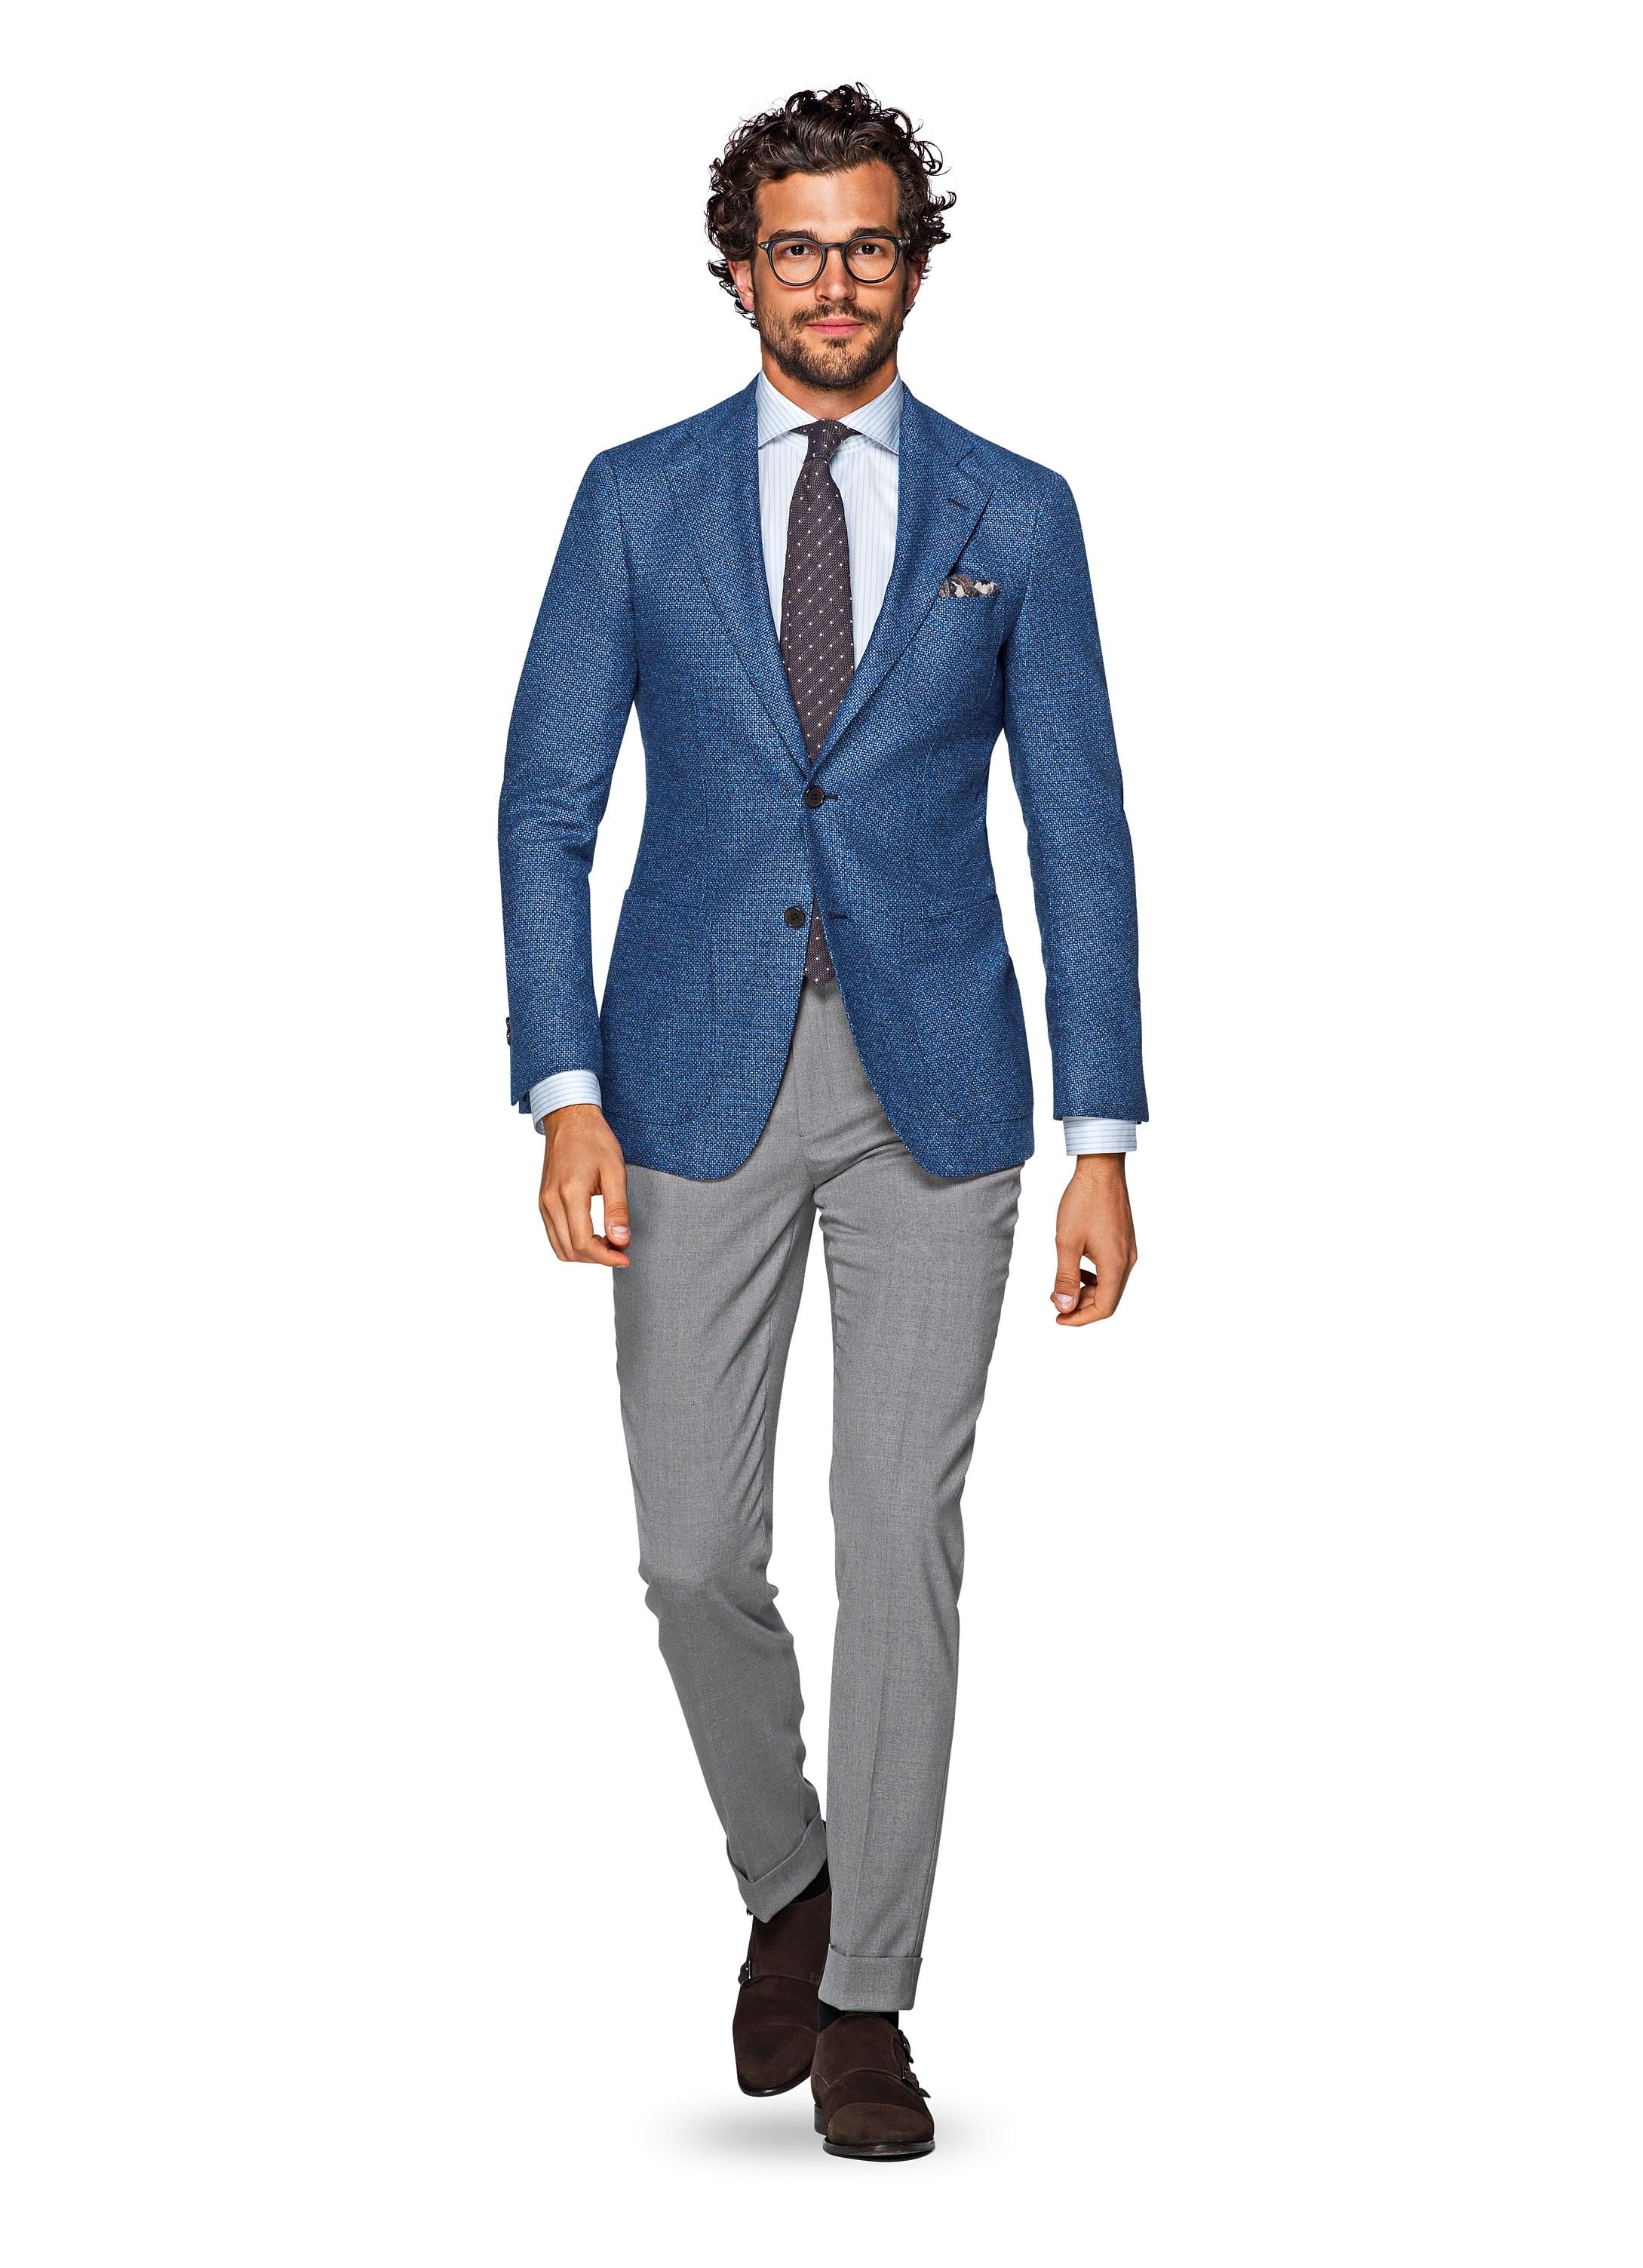 Jackets_Blue_Birds_Eye_Hudson_C908_Suitsupply_Online_Store_1.jpg